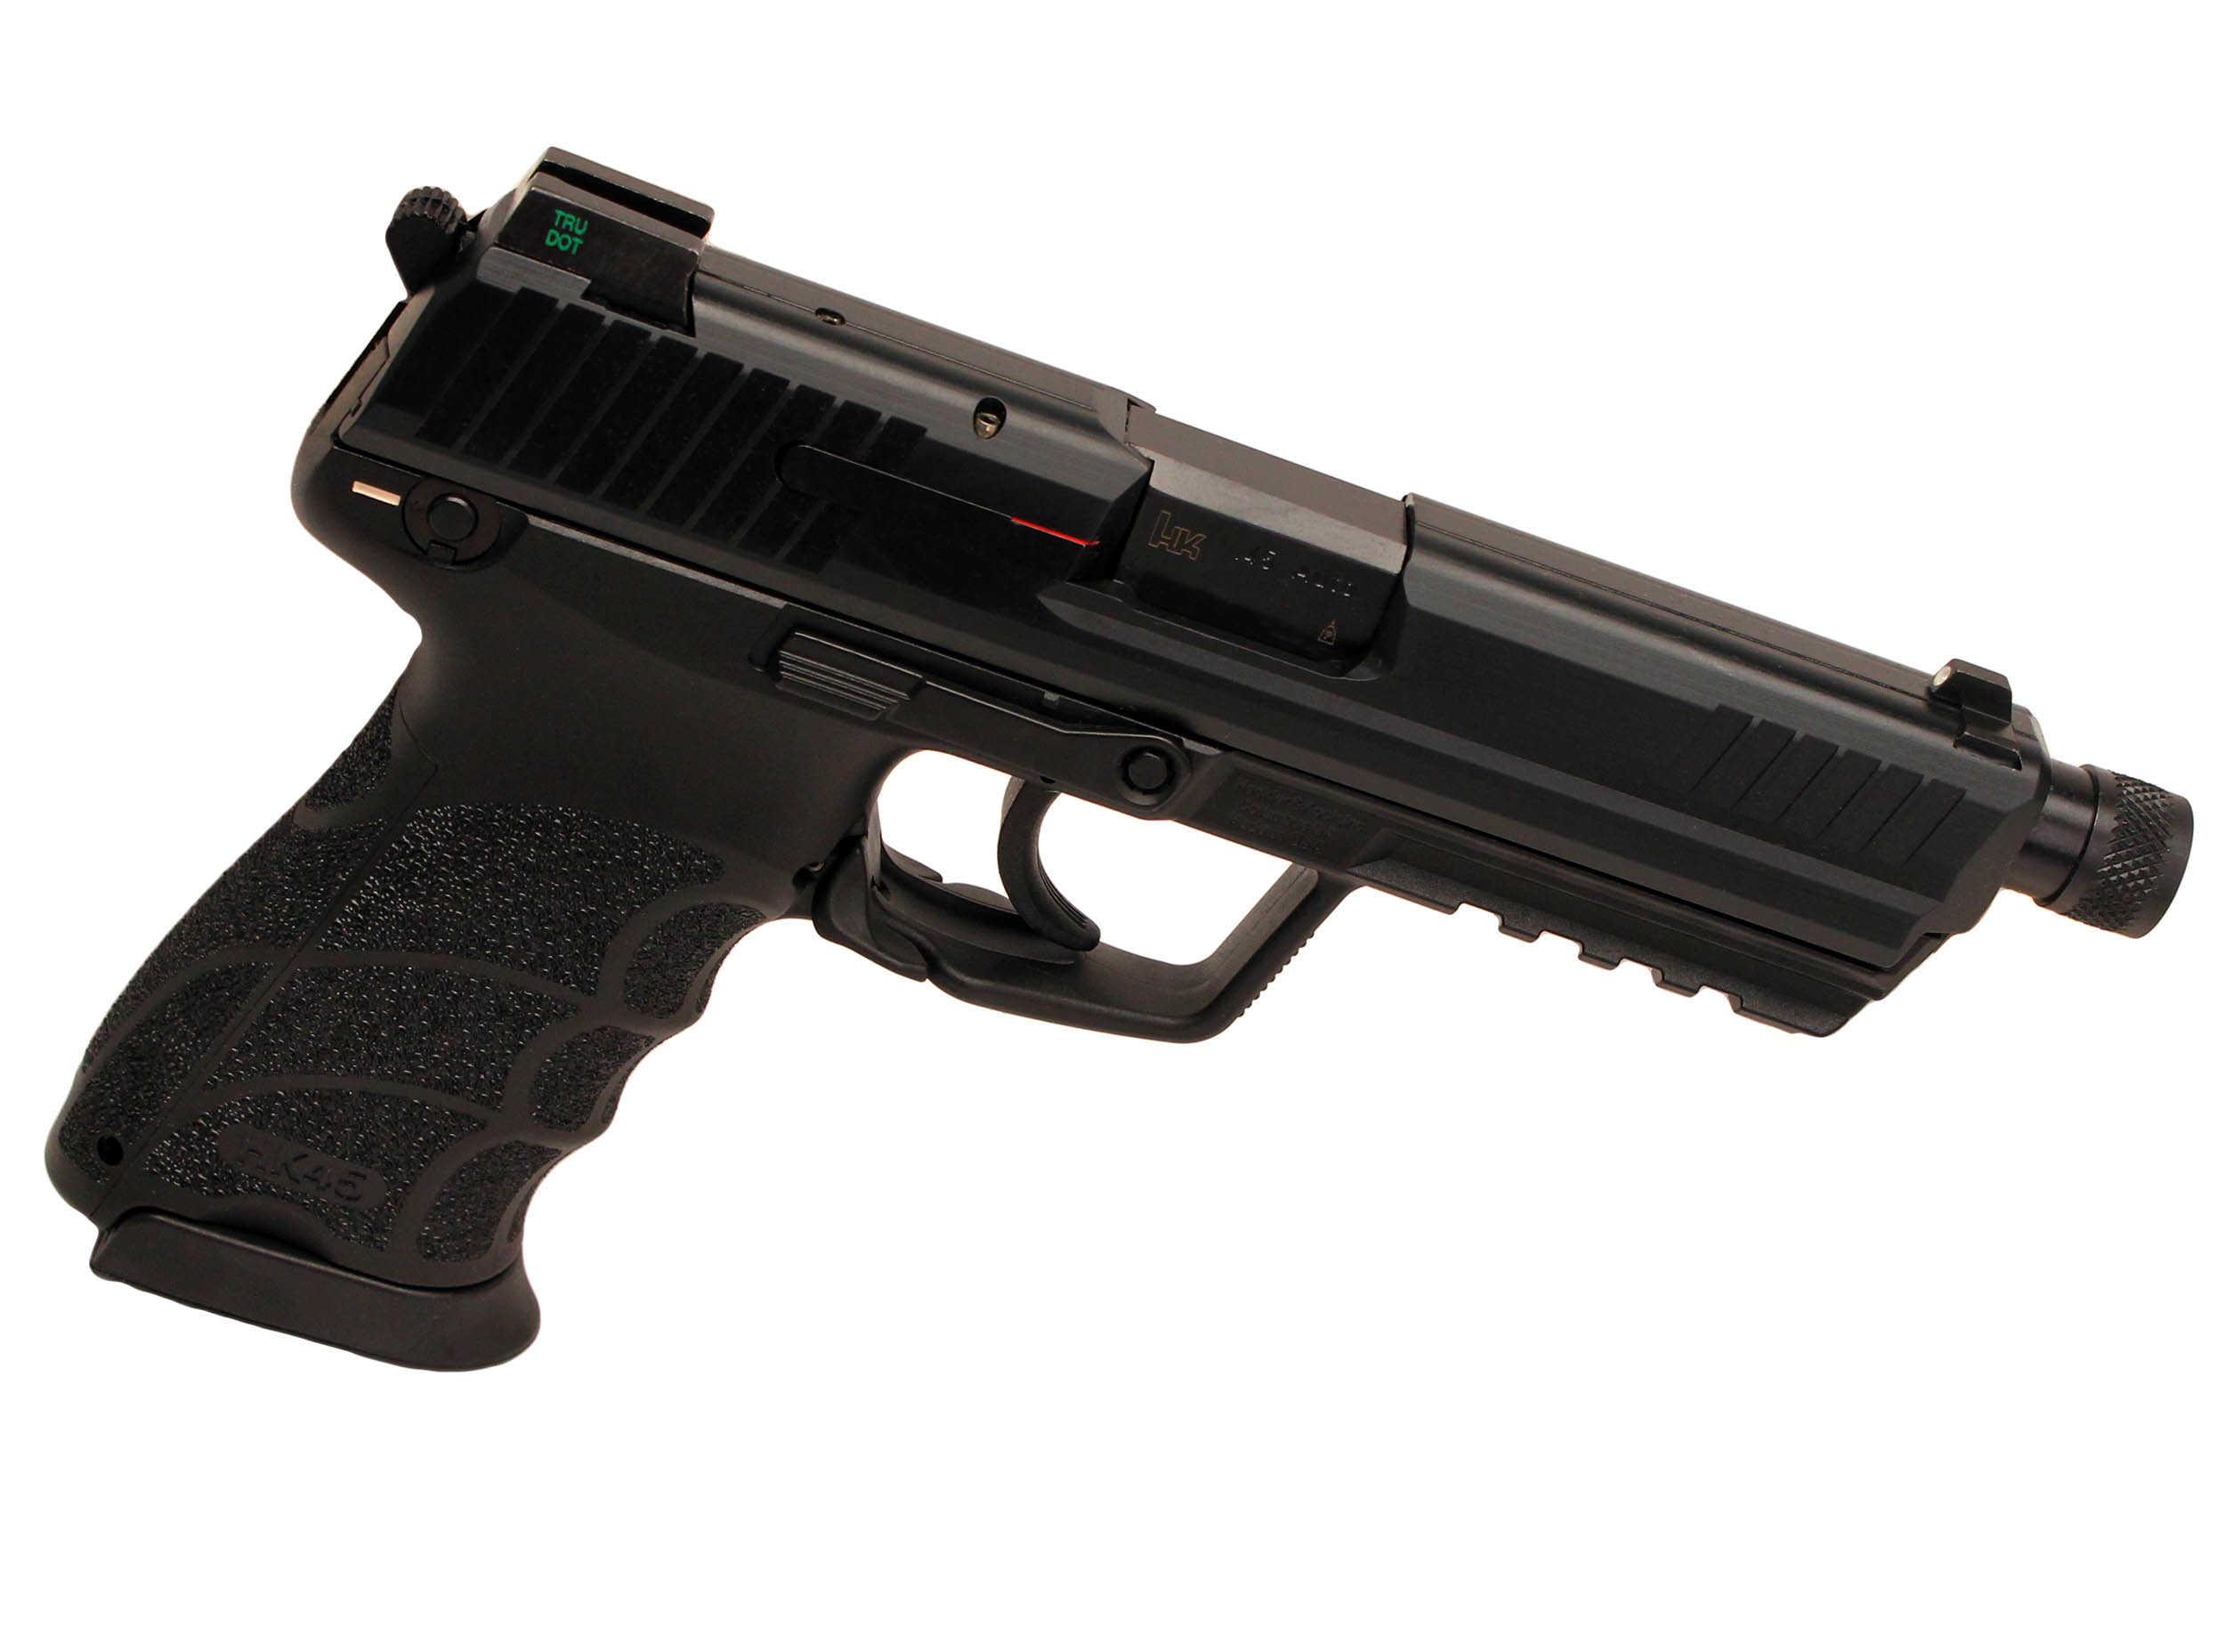 "Heckler & Koch HK45T V1 45 ACP 5.16"" Barrel 10 Round Black Synthetic Grip V1 Double/Single Action Trigger Rail 3 Dot Sights Black Finish Semi Automatic Pistol 745001TA5"